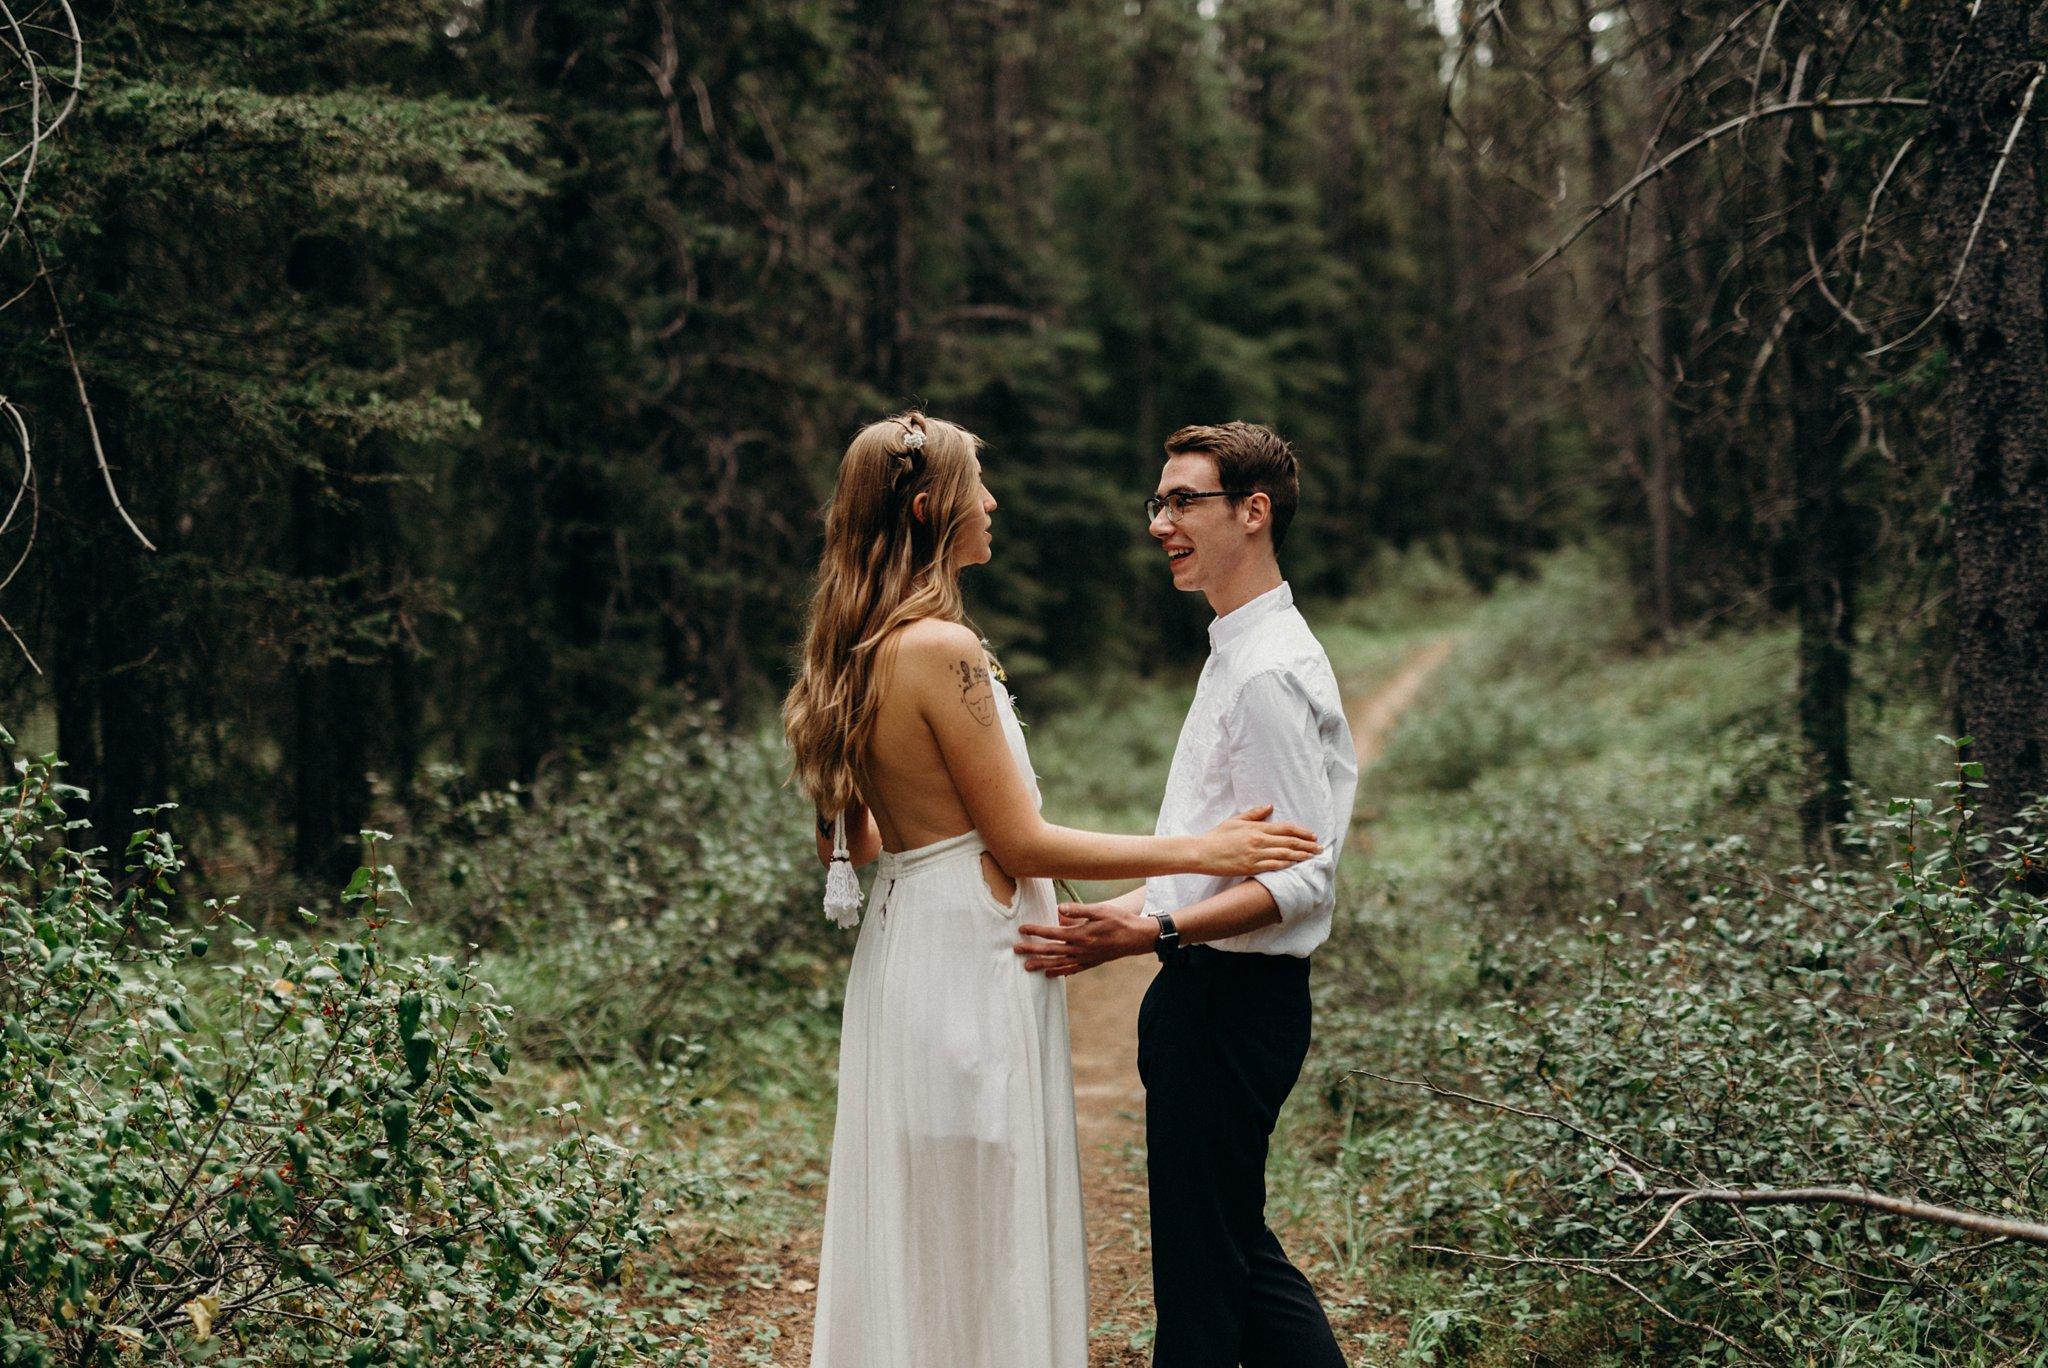 kaihla_tonai_intimate_wedding_elopement_photographer_6366.jpg